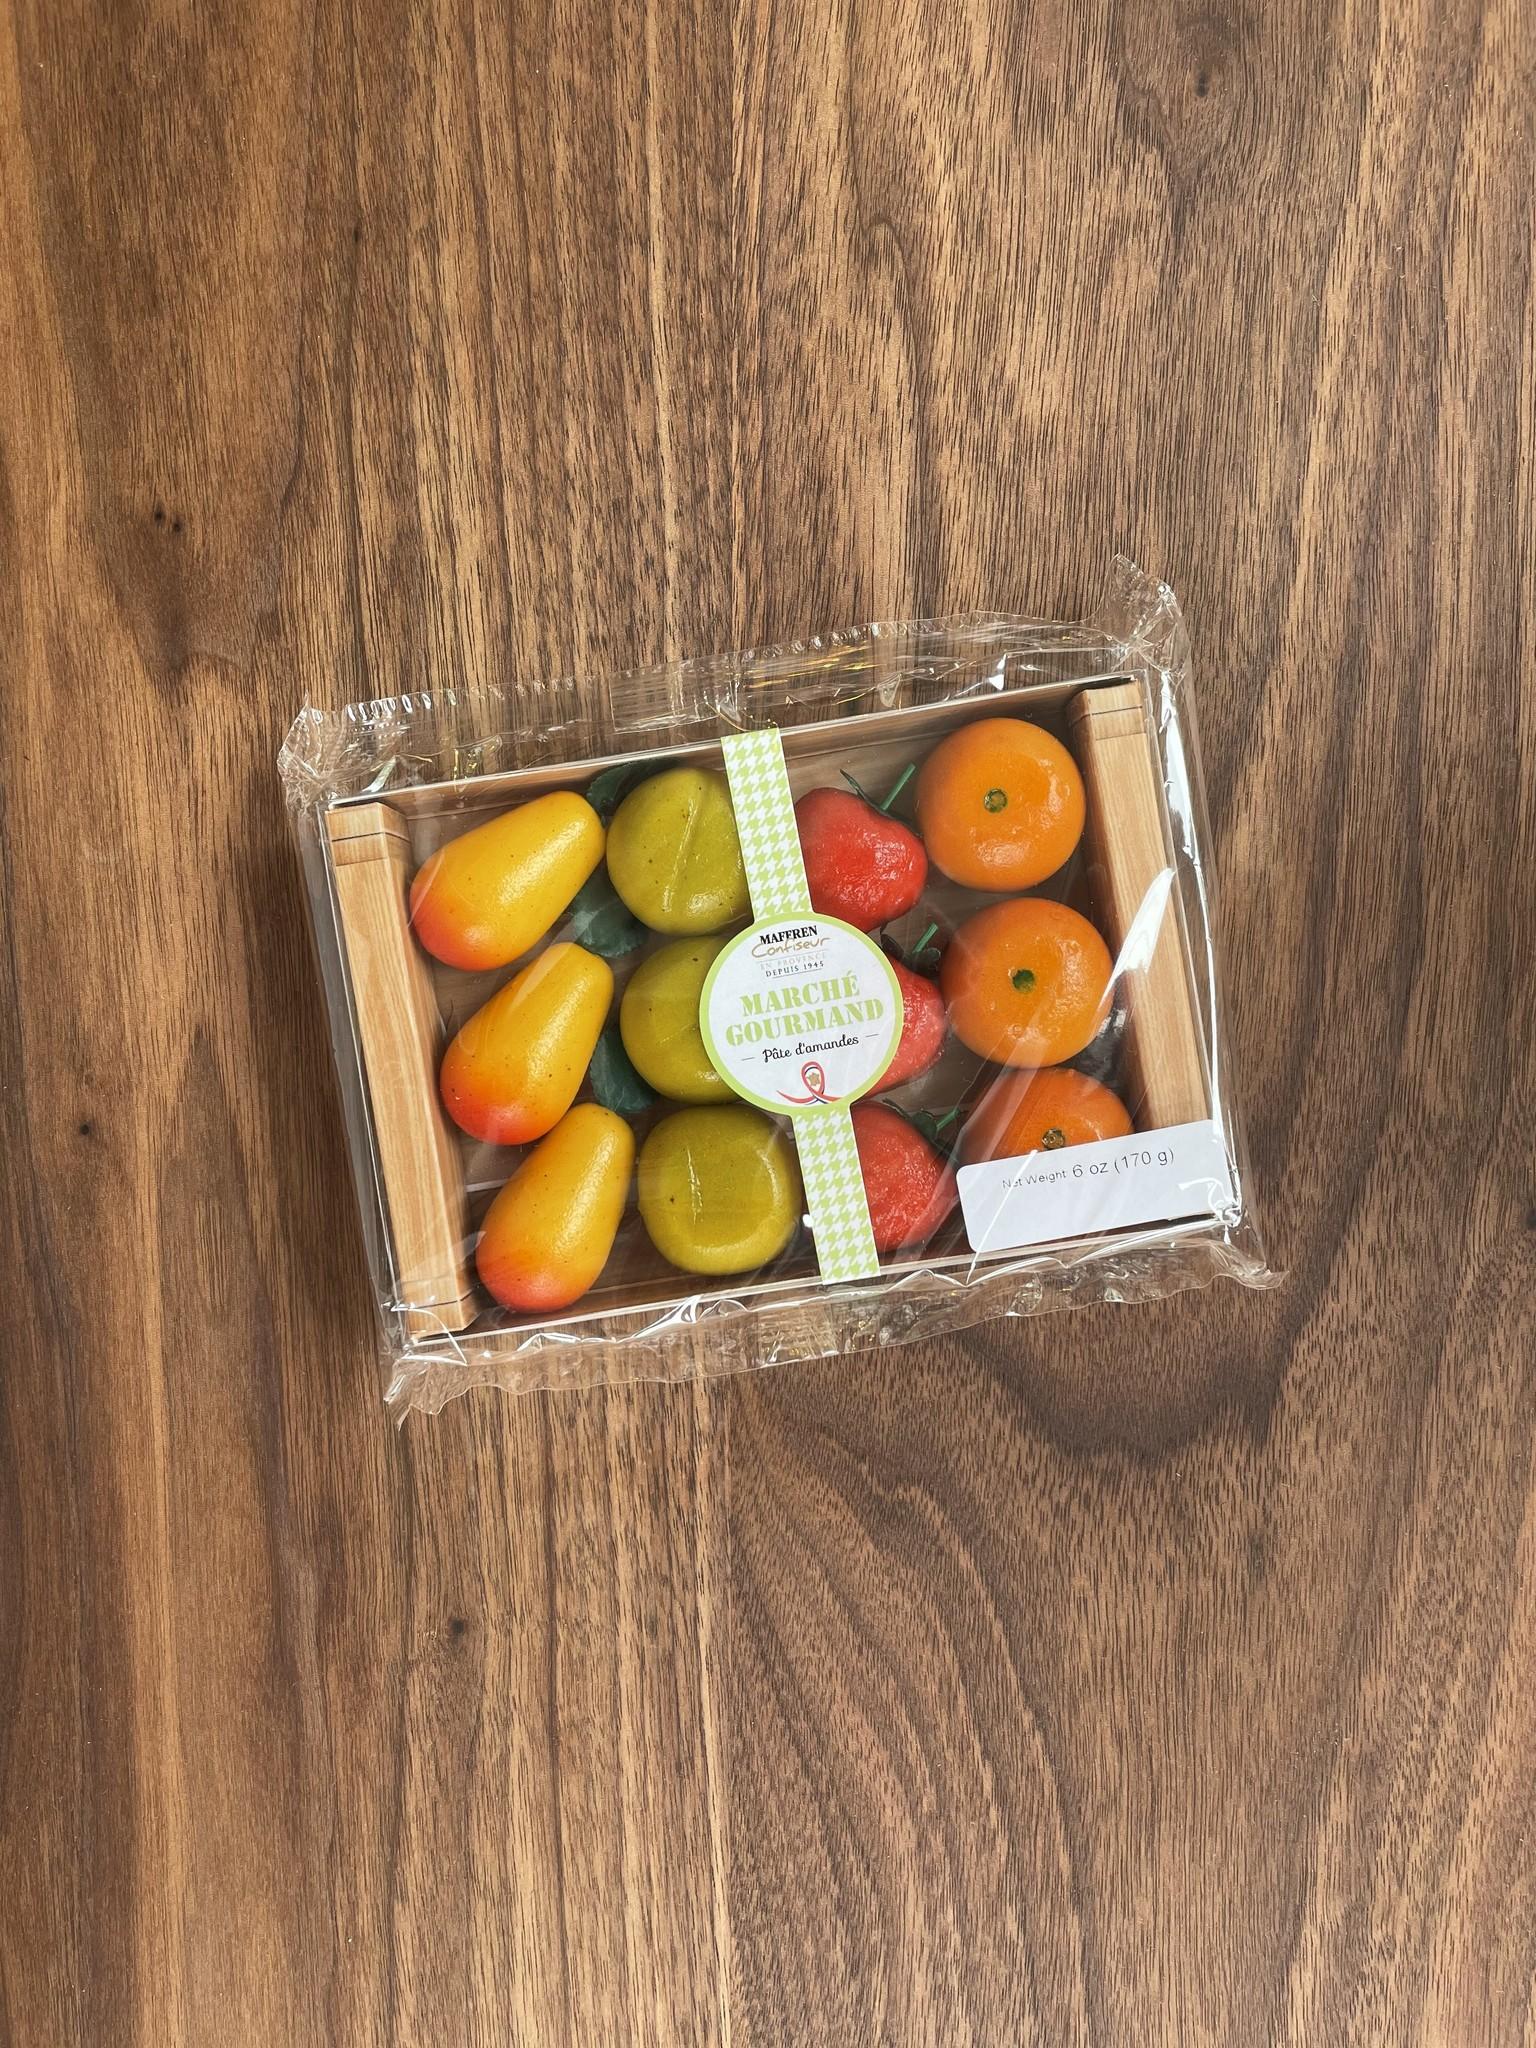 Maffren Assorted Fruit Marzipan, Crate of 12-1